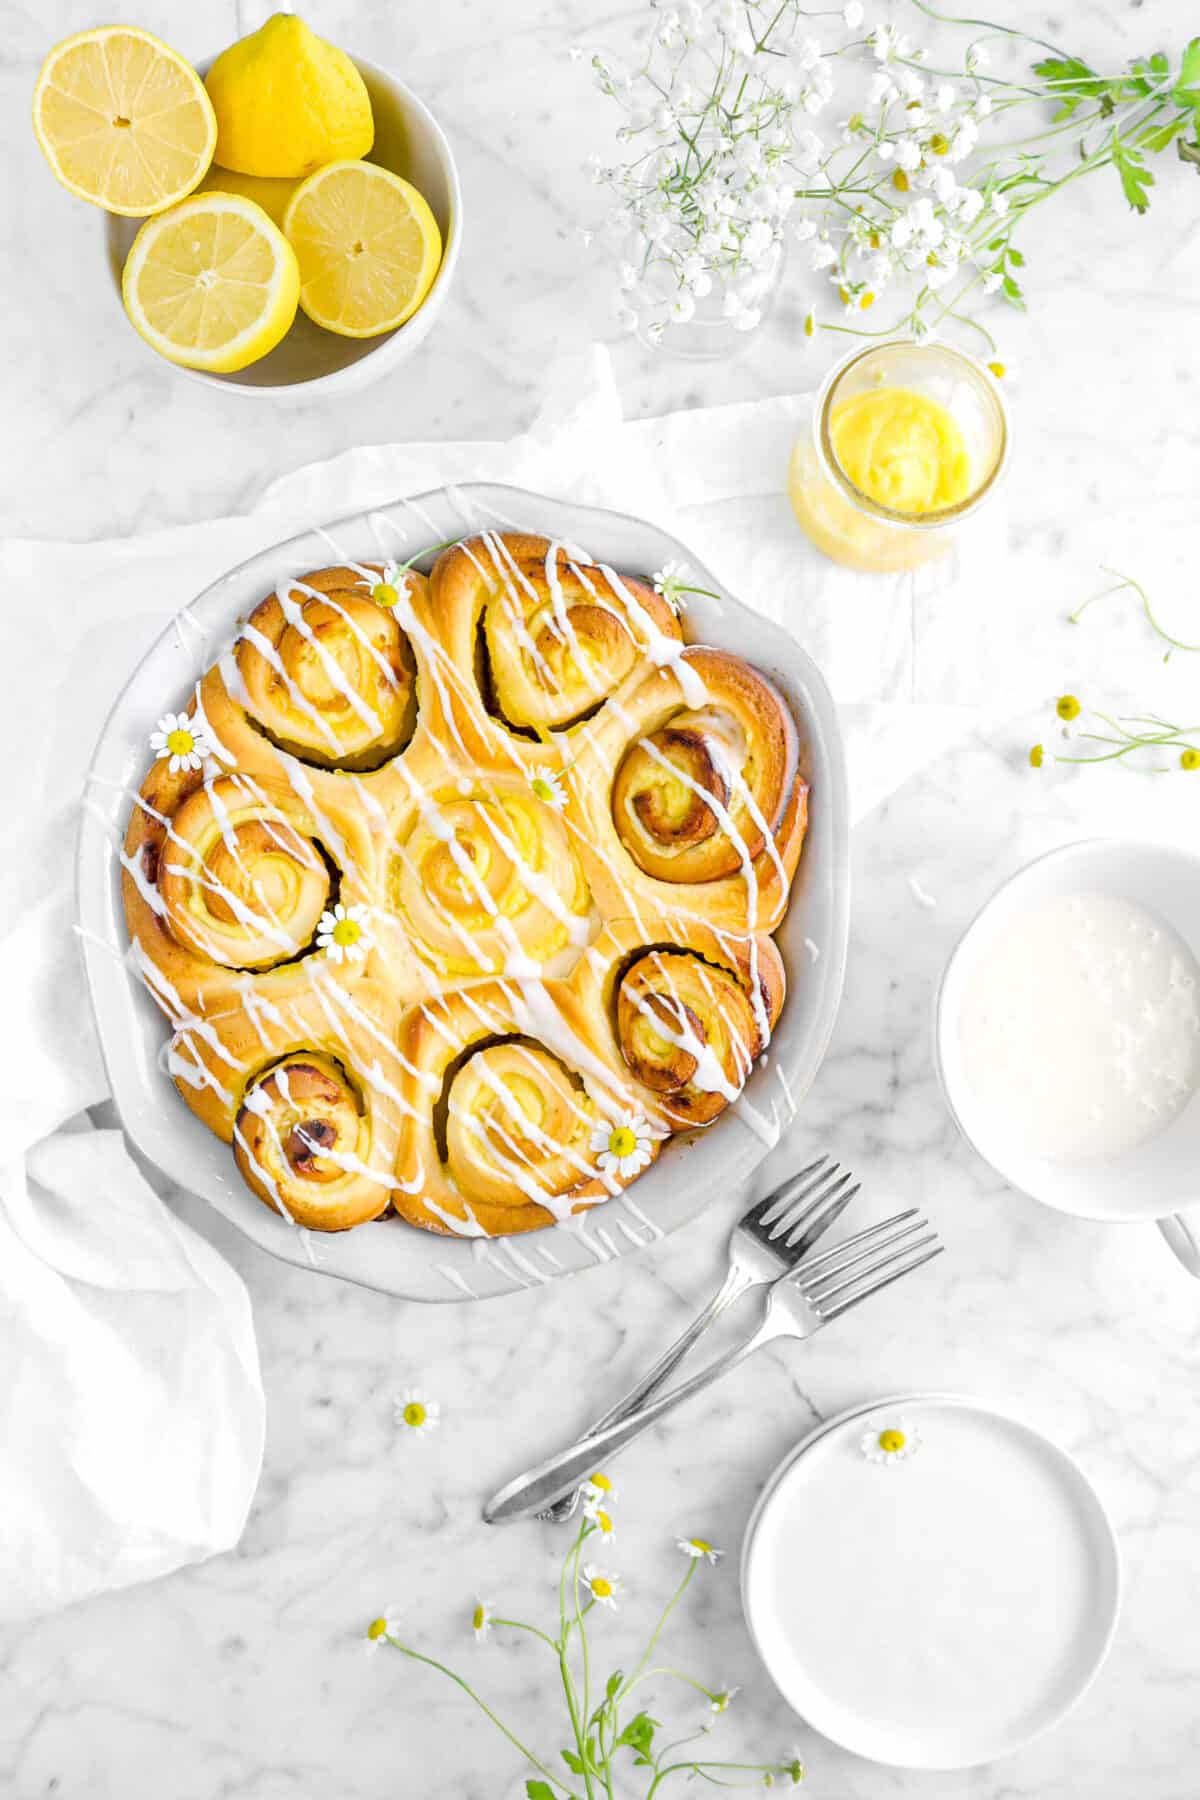 overhead shot of lemon rolls in pie pan with a napkin, forks, lemons, flowers, lemon curd, and plates